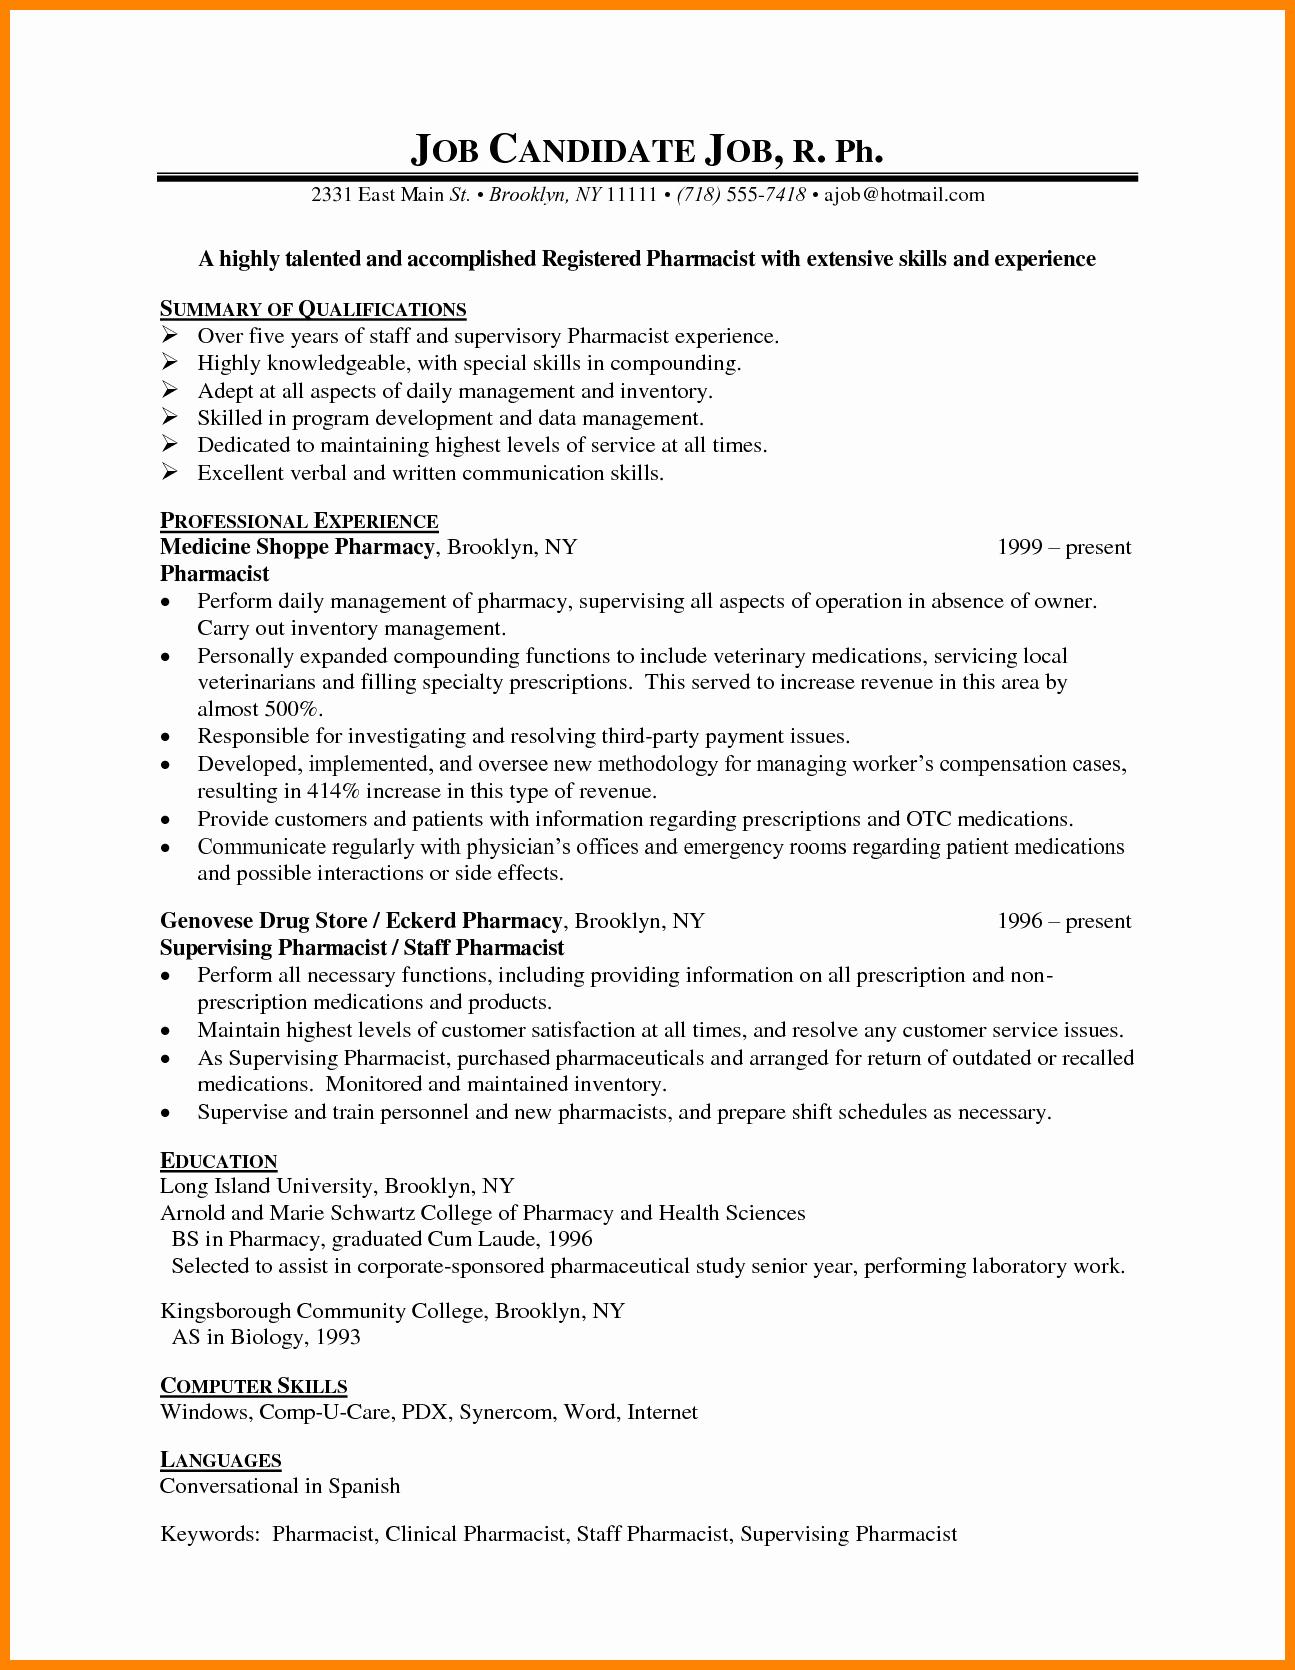 Pharmacist Curriculum Vitae Examples Beautiful 8 Cv Sample for Pharmacist